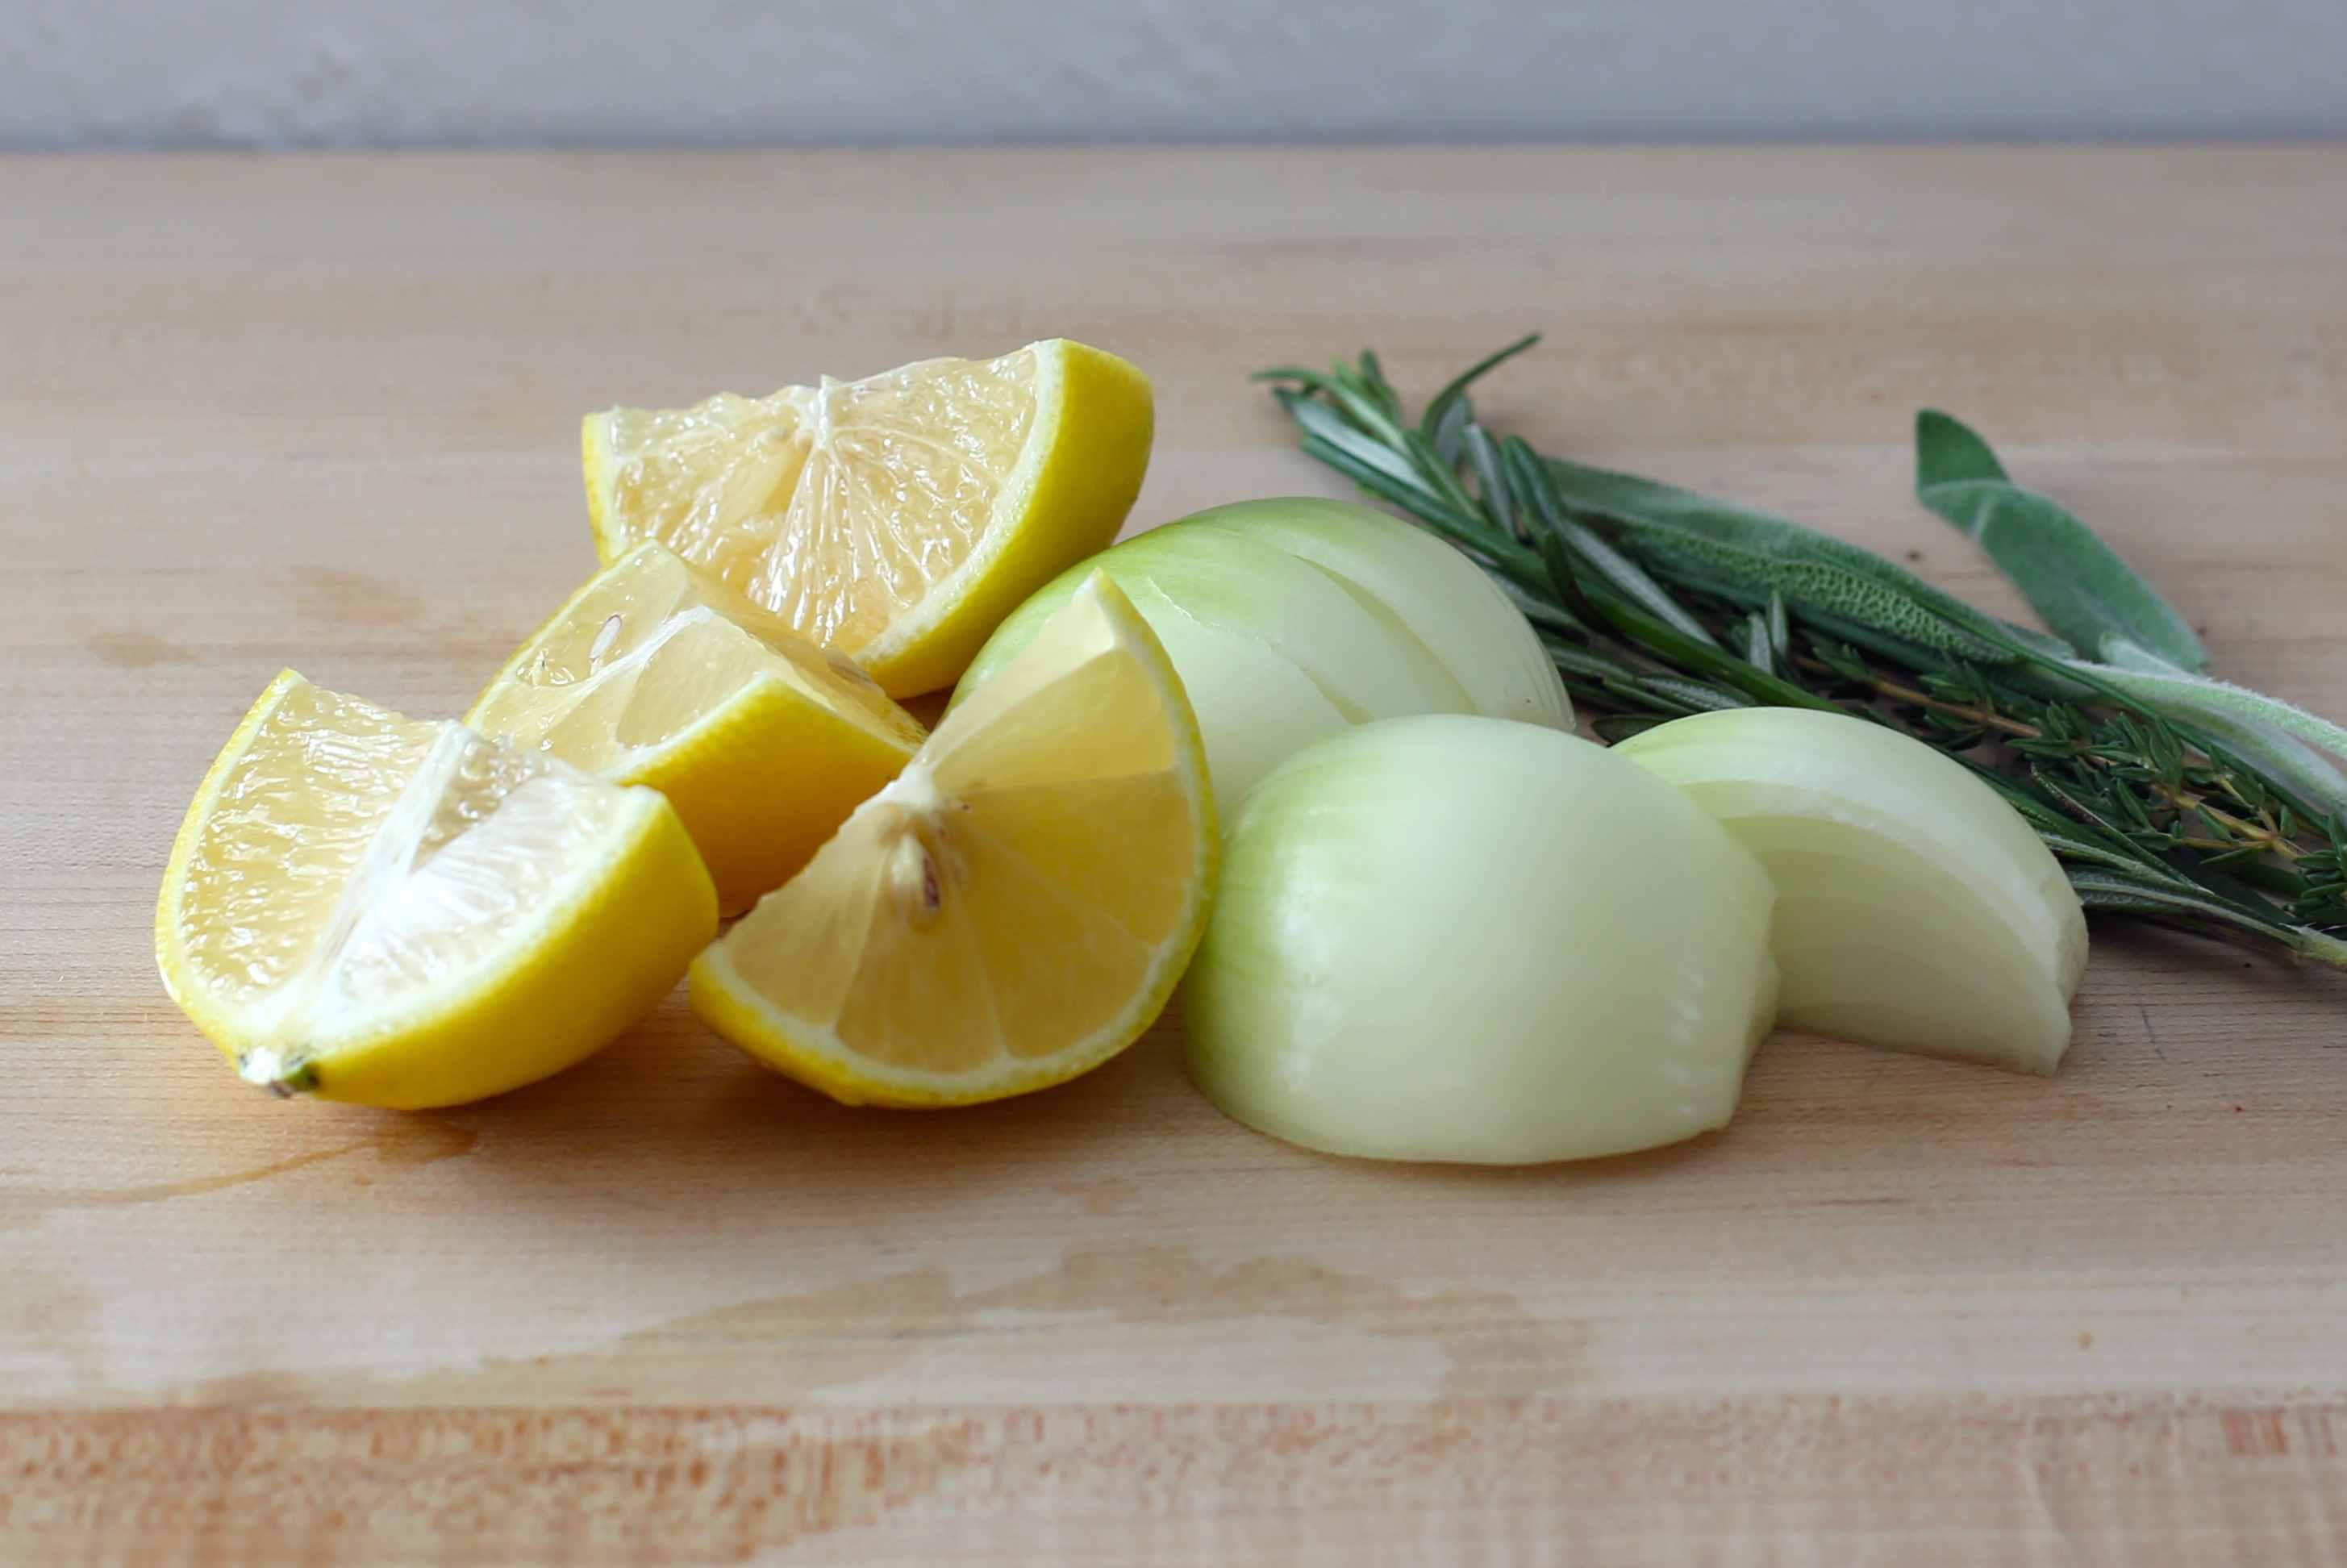 Quarter the lemon and onion